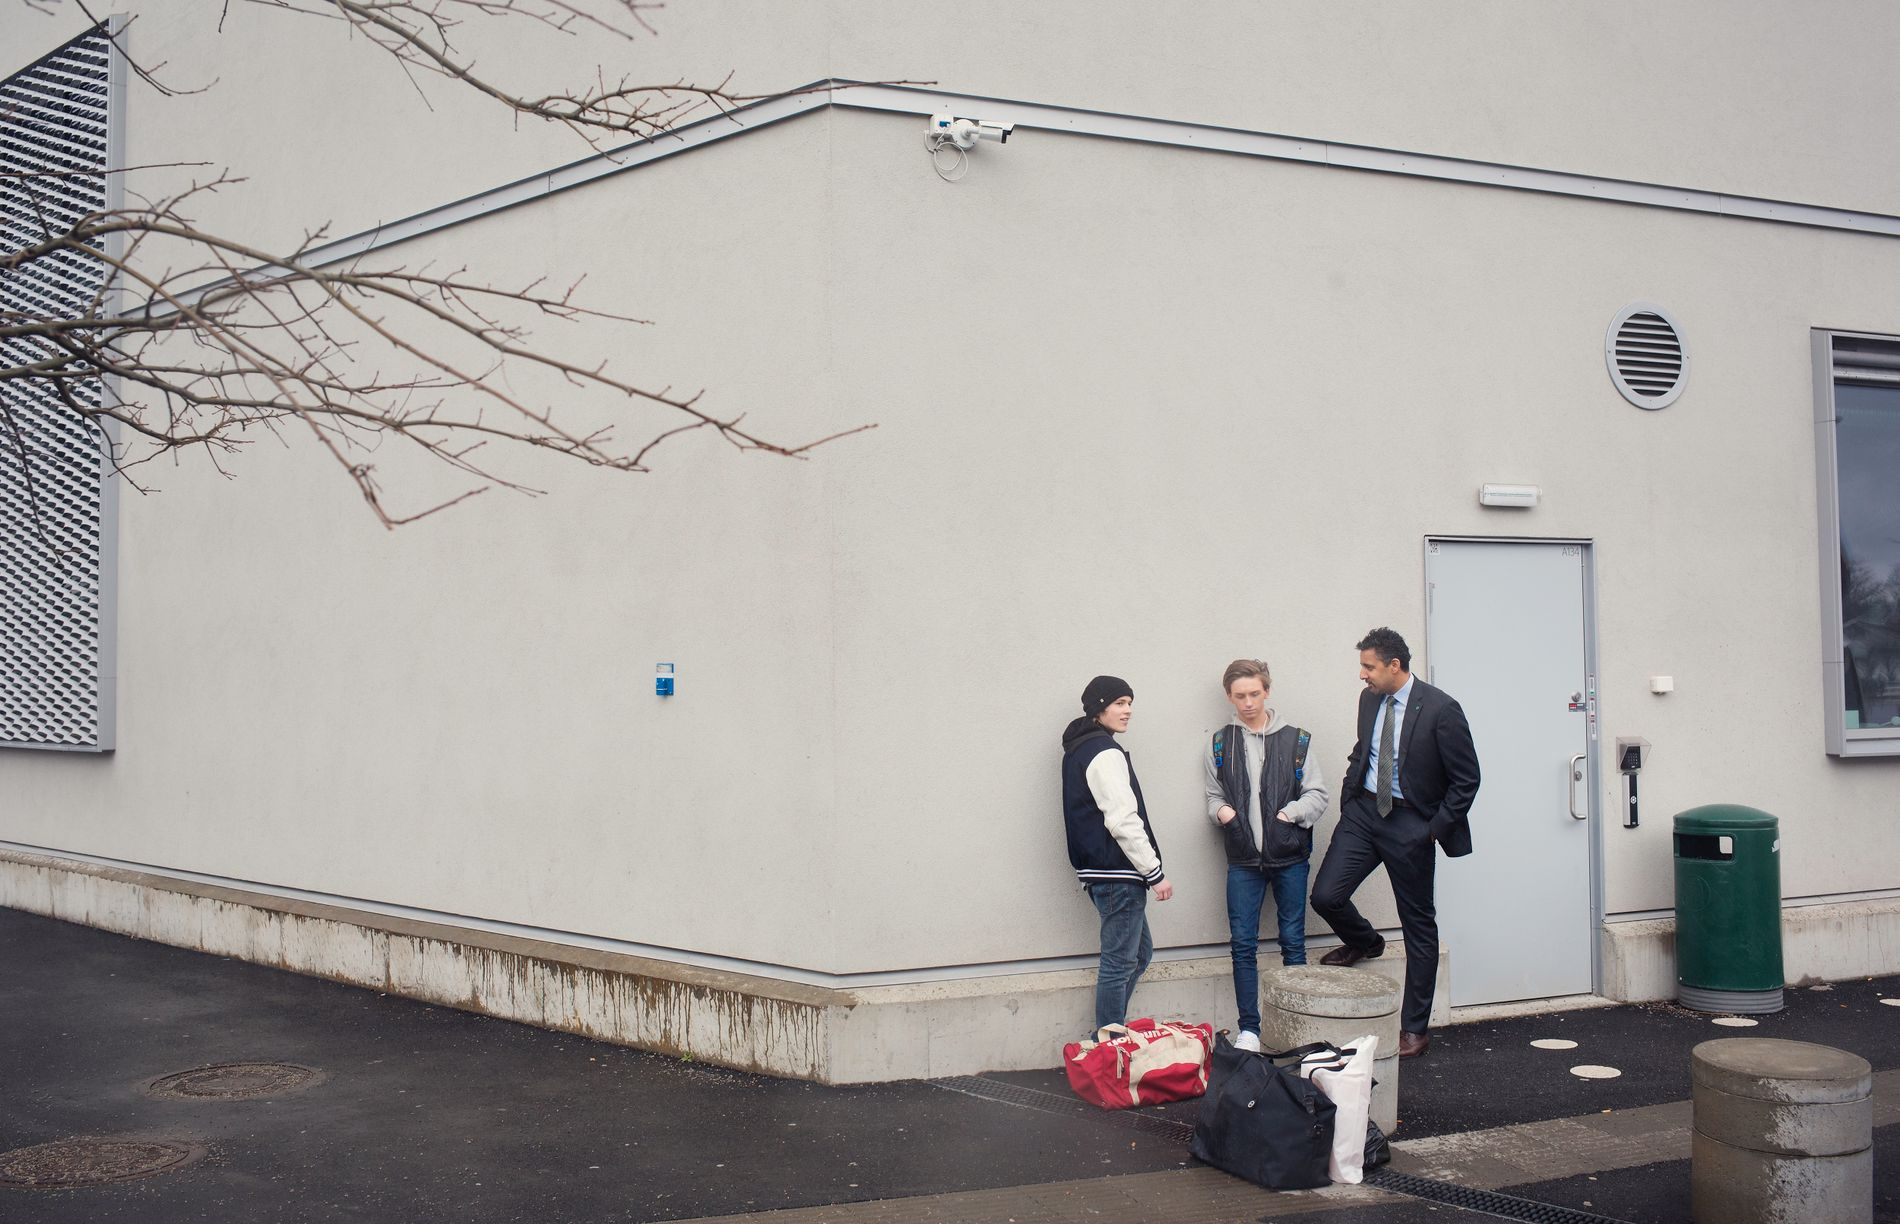 OVERVÅKET: Venstres Abid Raja fotografert både av VG og et overvåkningskamera på Færder videregående skole i Tønsberg ved en tidligere anledning. Her sammen med elevene Nicklas Melsom (t.v.) og Kevin Fossum.